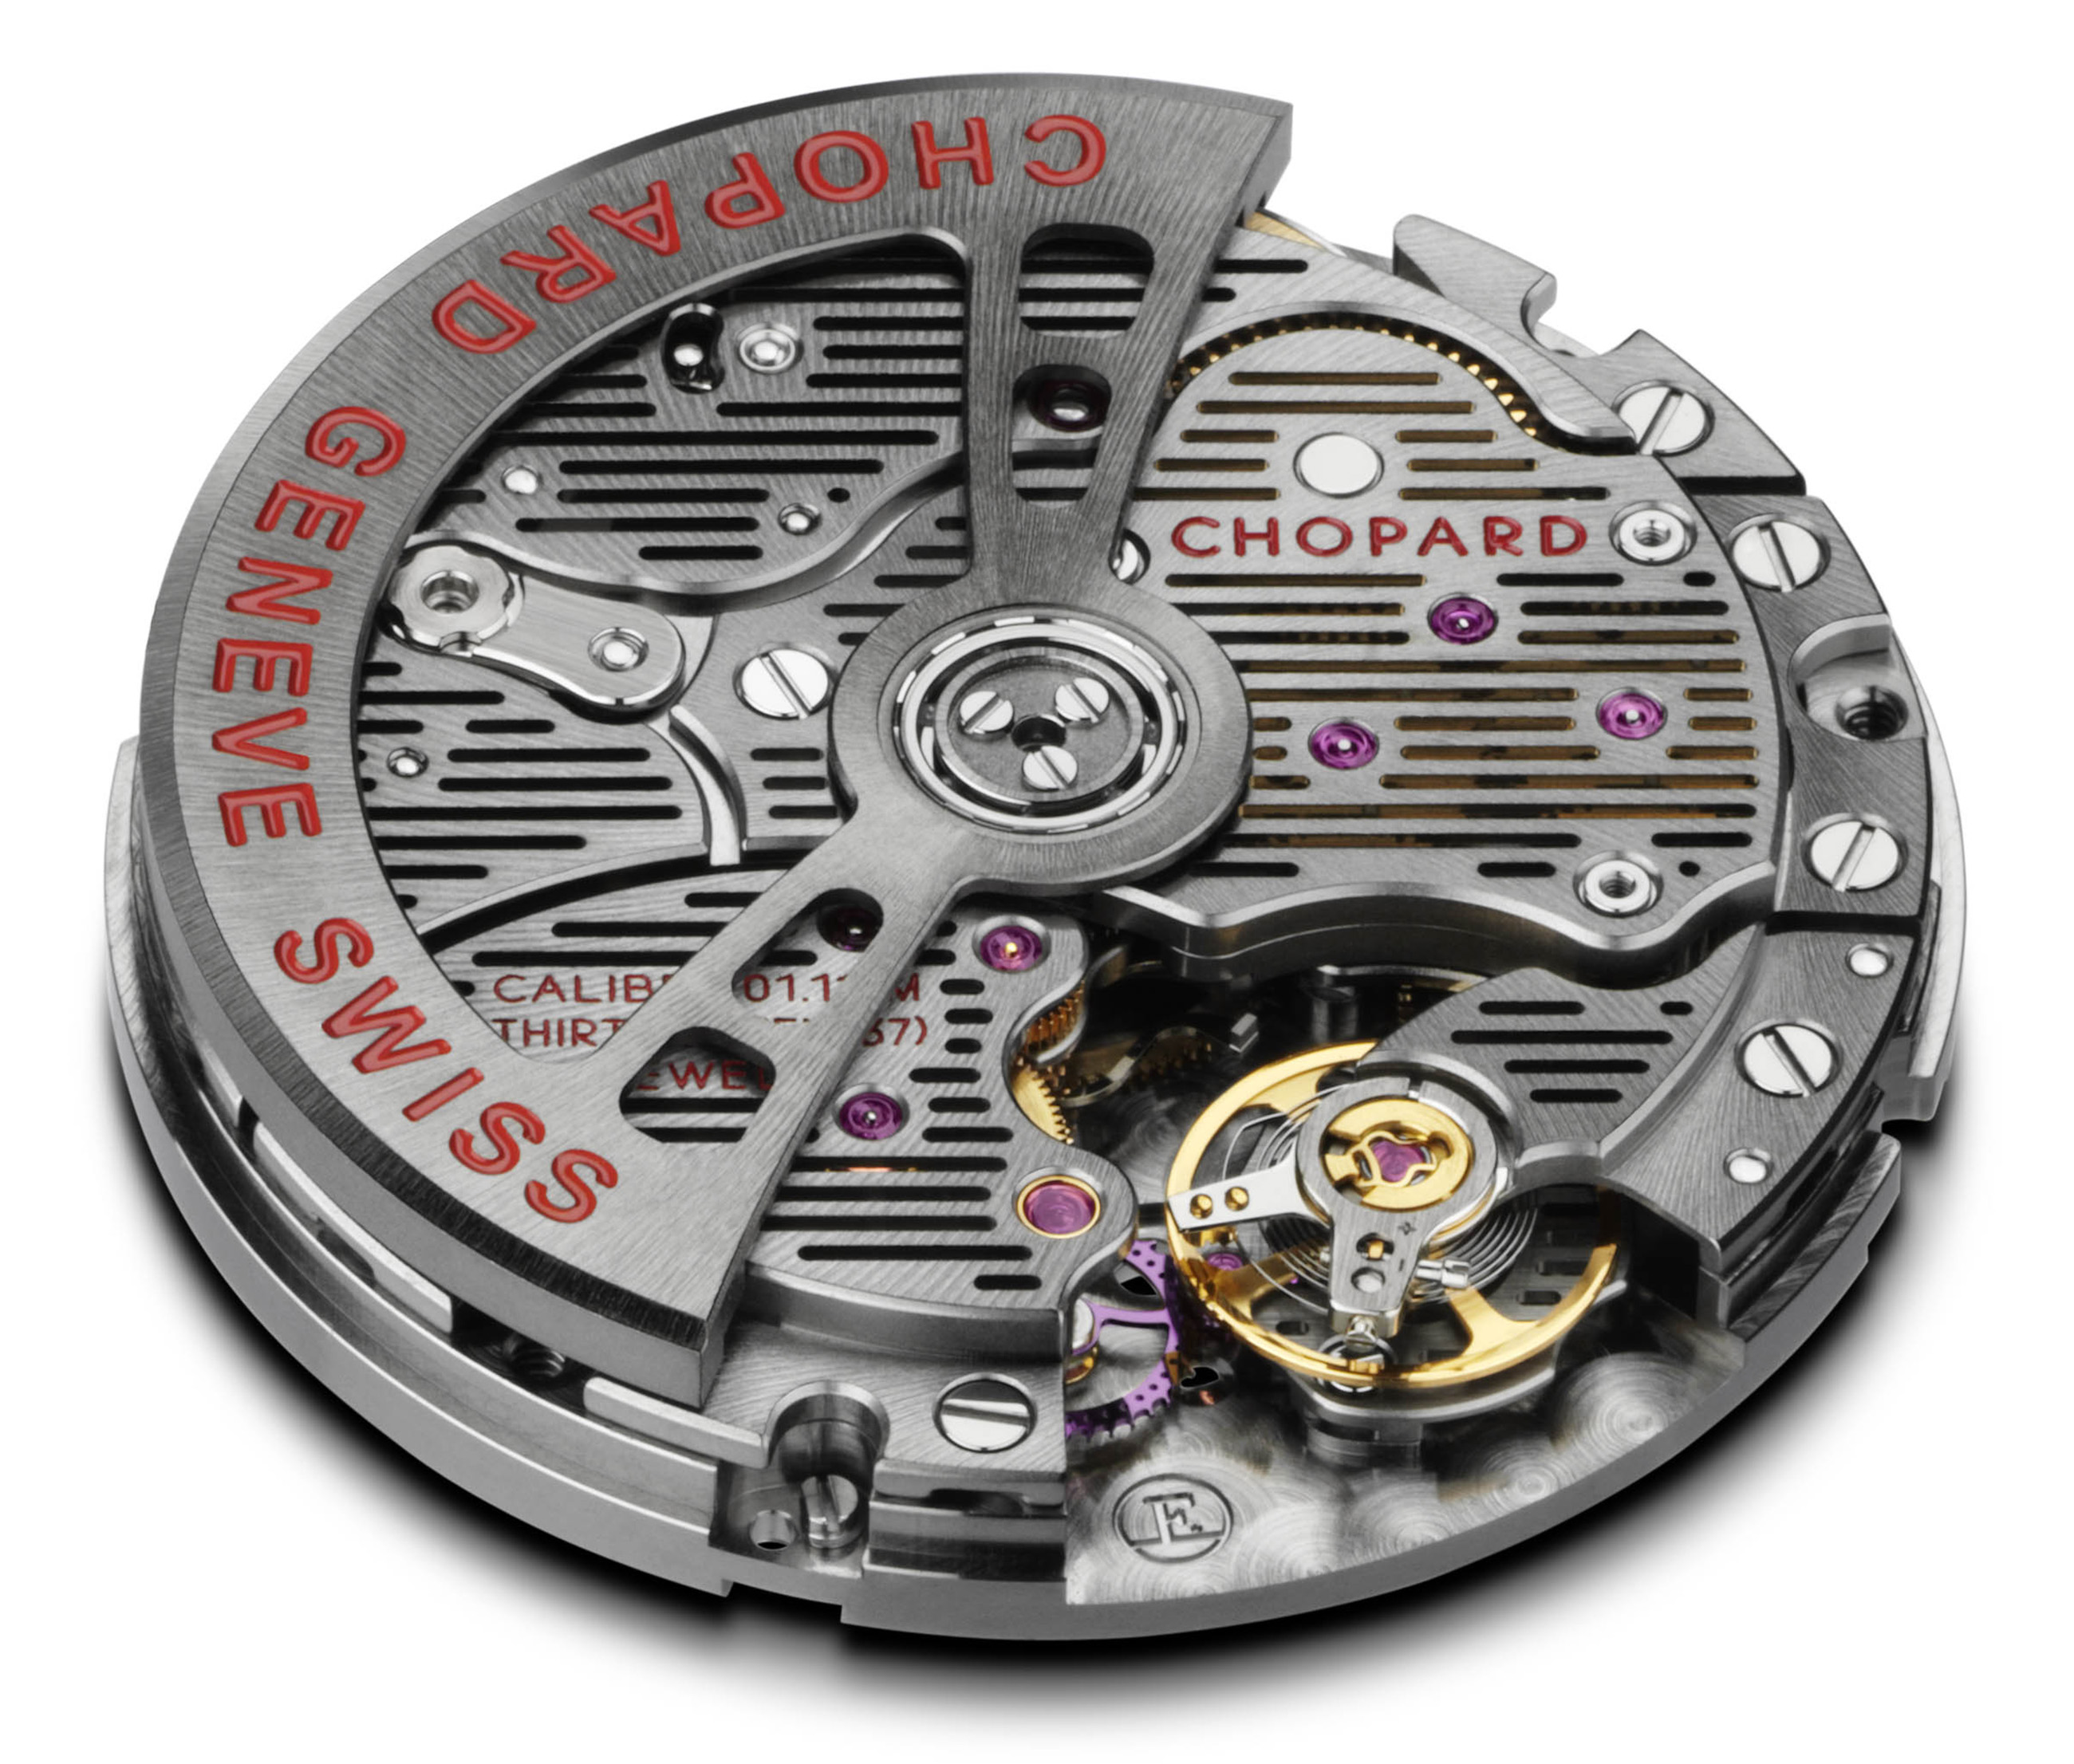 Calibre Chopard 01.11-M - 1 copy